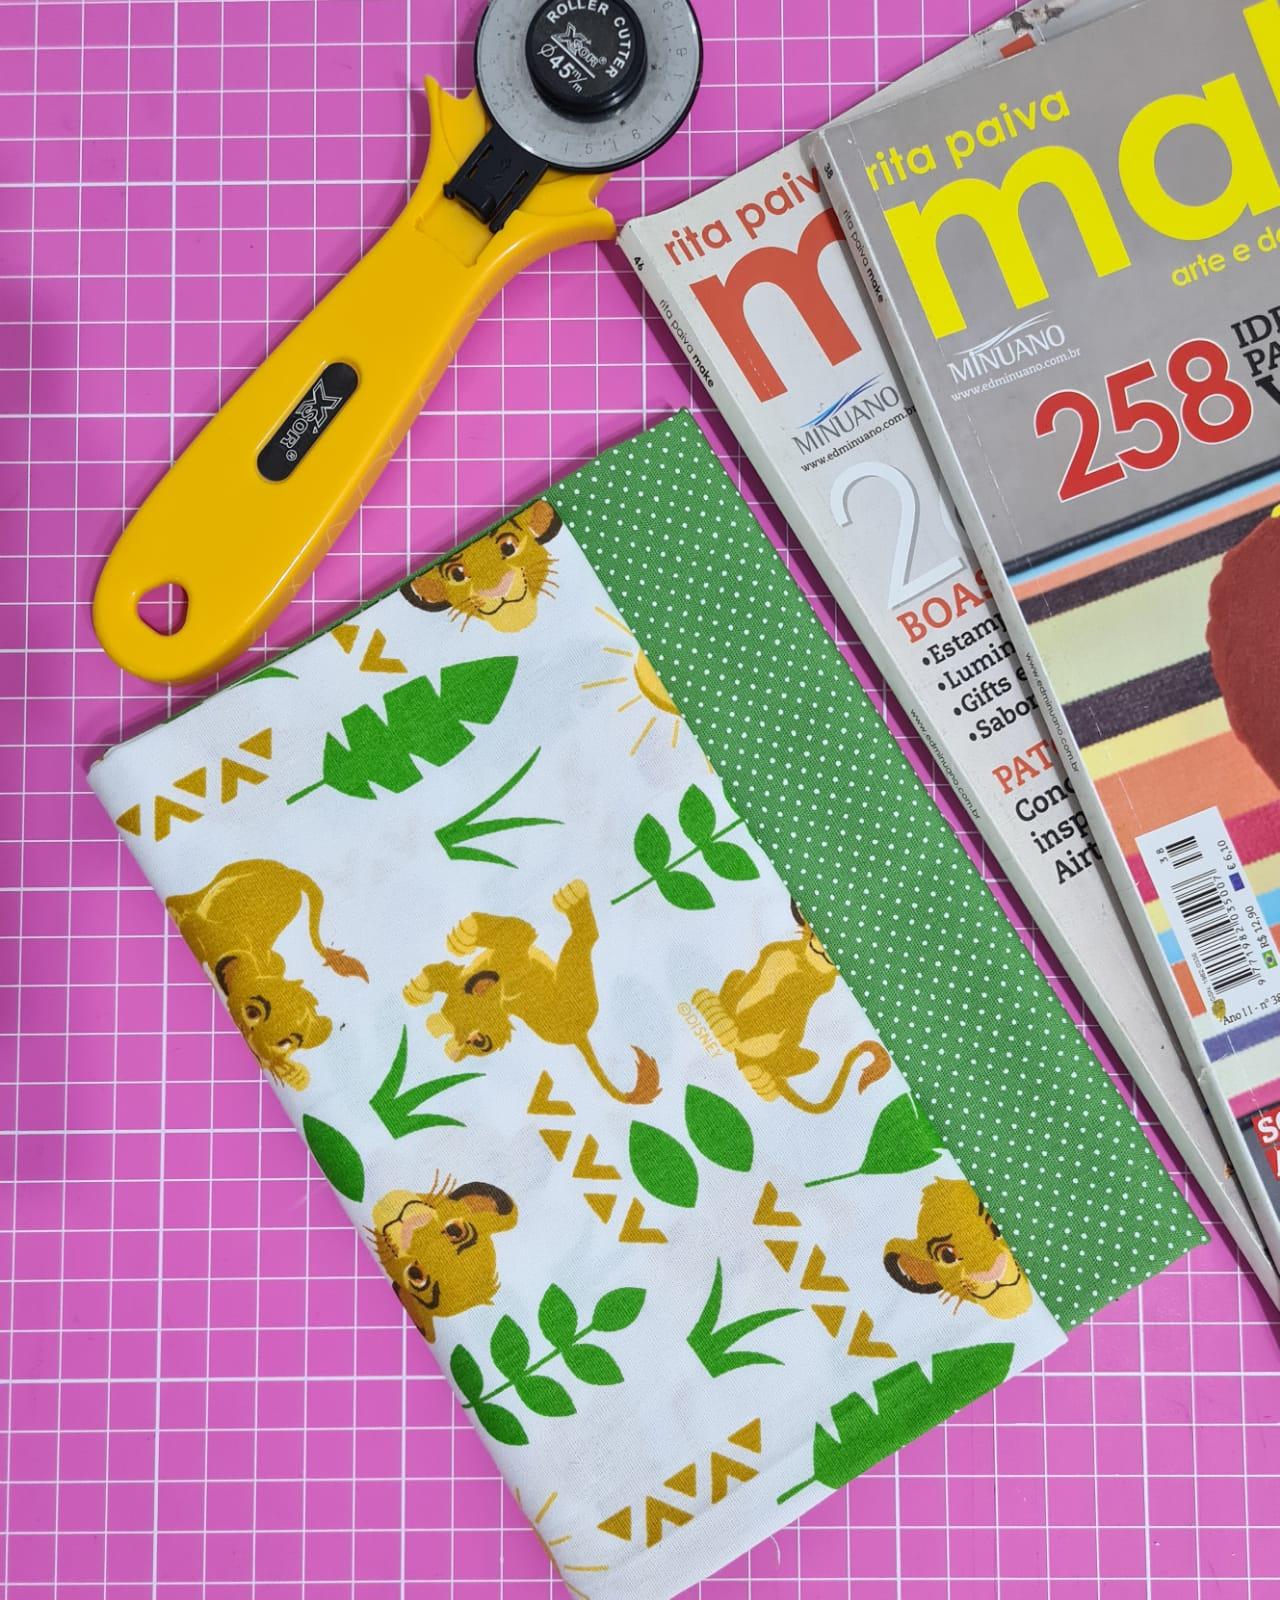 Kit de Tecidos K096 (2 Cortes de 50 x 75cm)